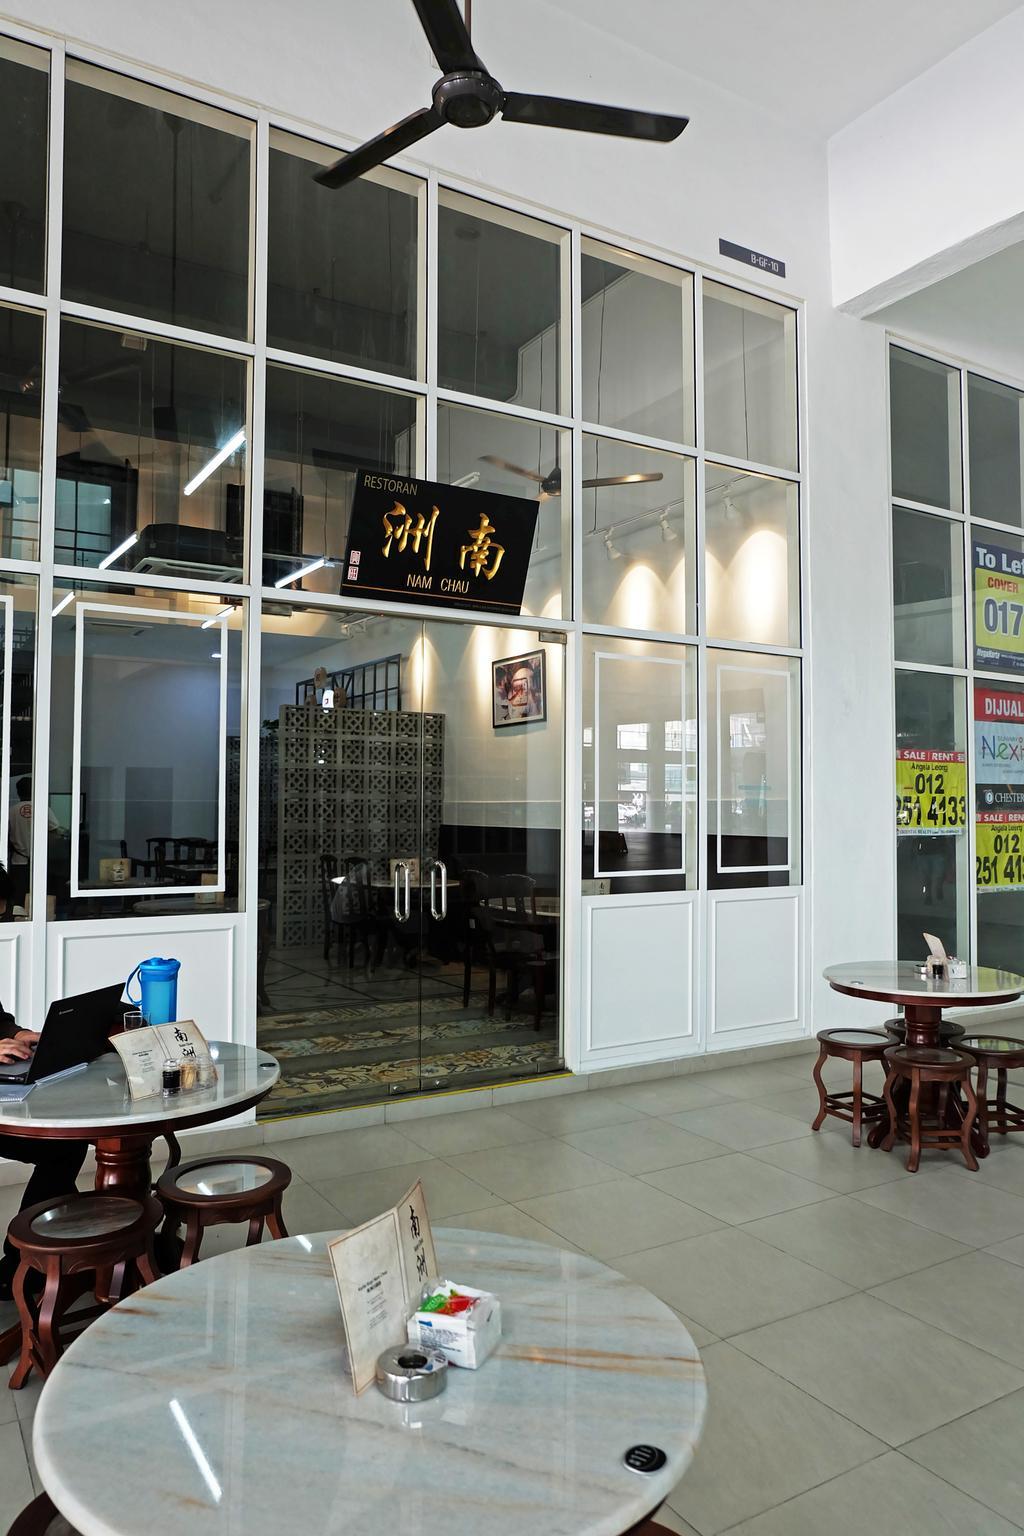 Nam Chau, Nexis Sunway Damansara, Commercial, Interior Designer, Spazio Design Sdn Bhd, Traditional, Dining Table, Furniture, Table, Cafe, Restaurant